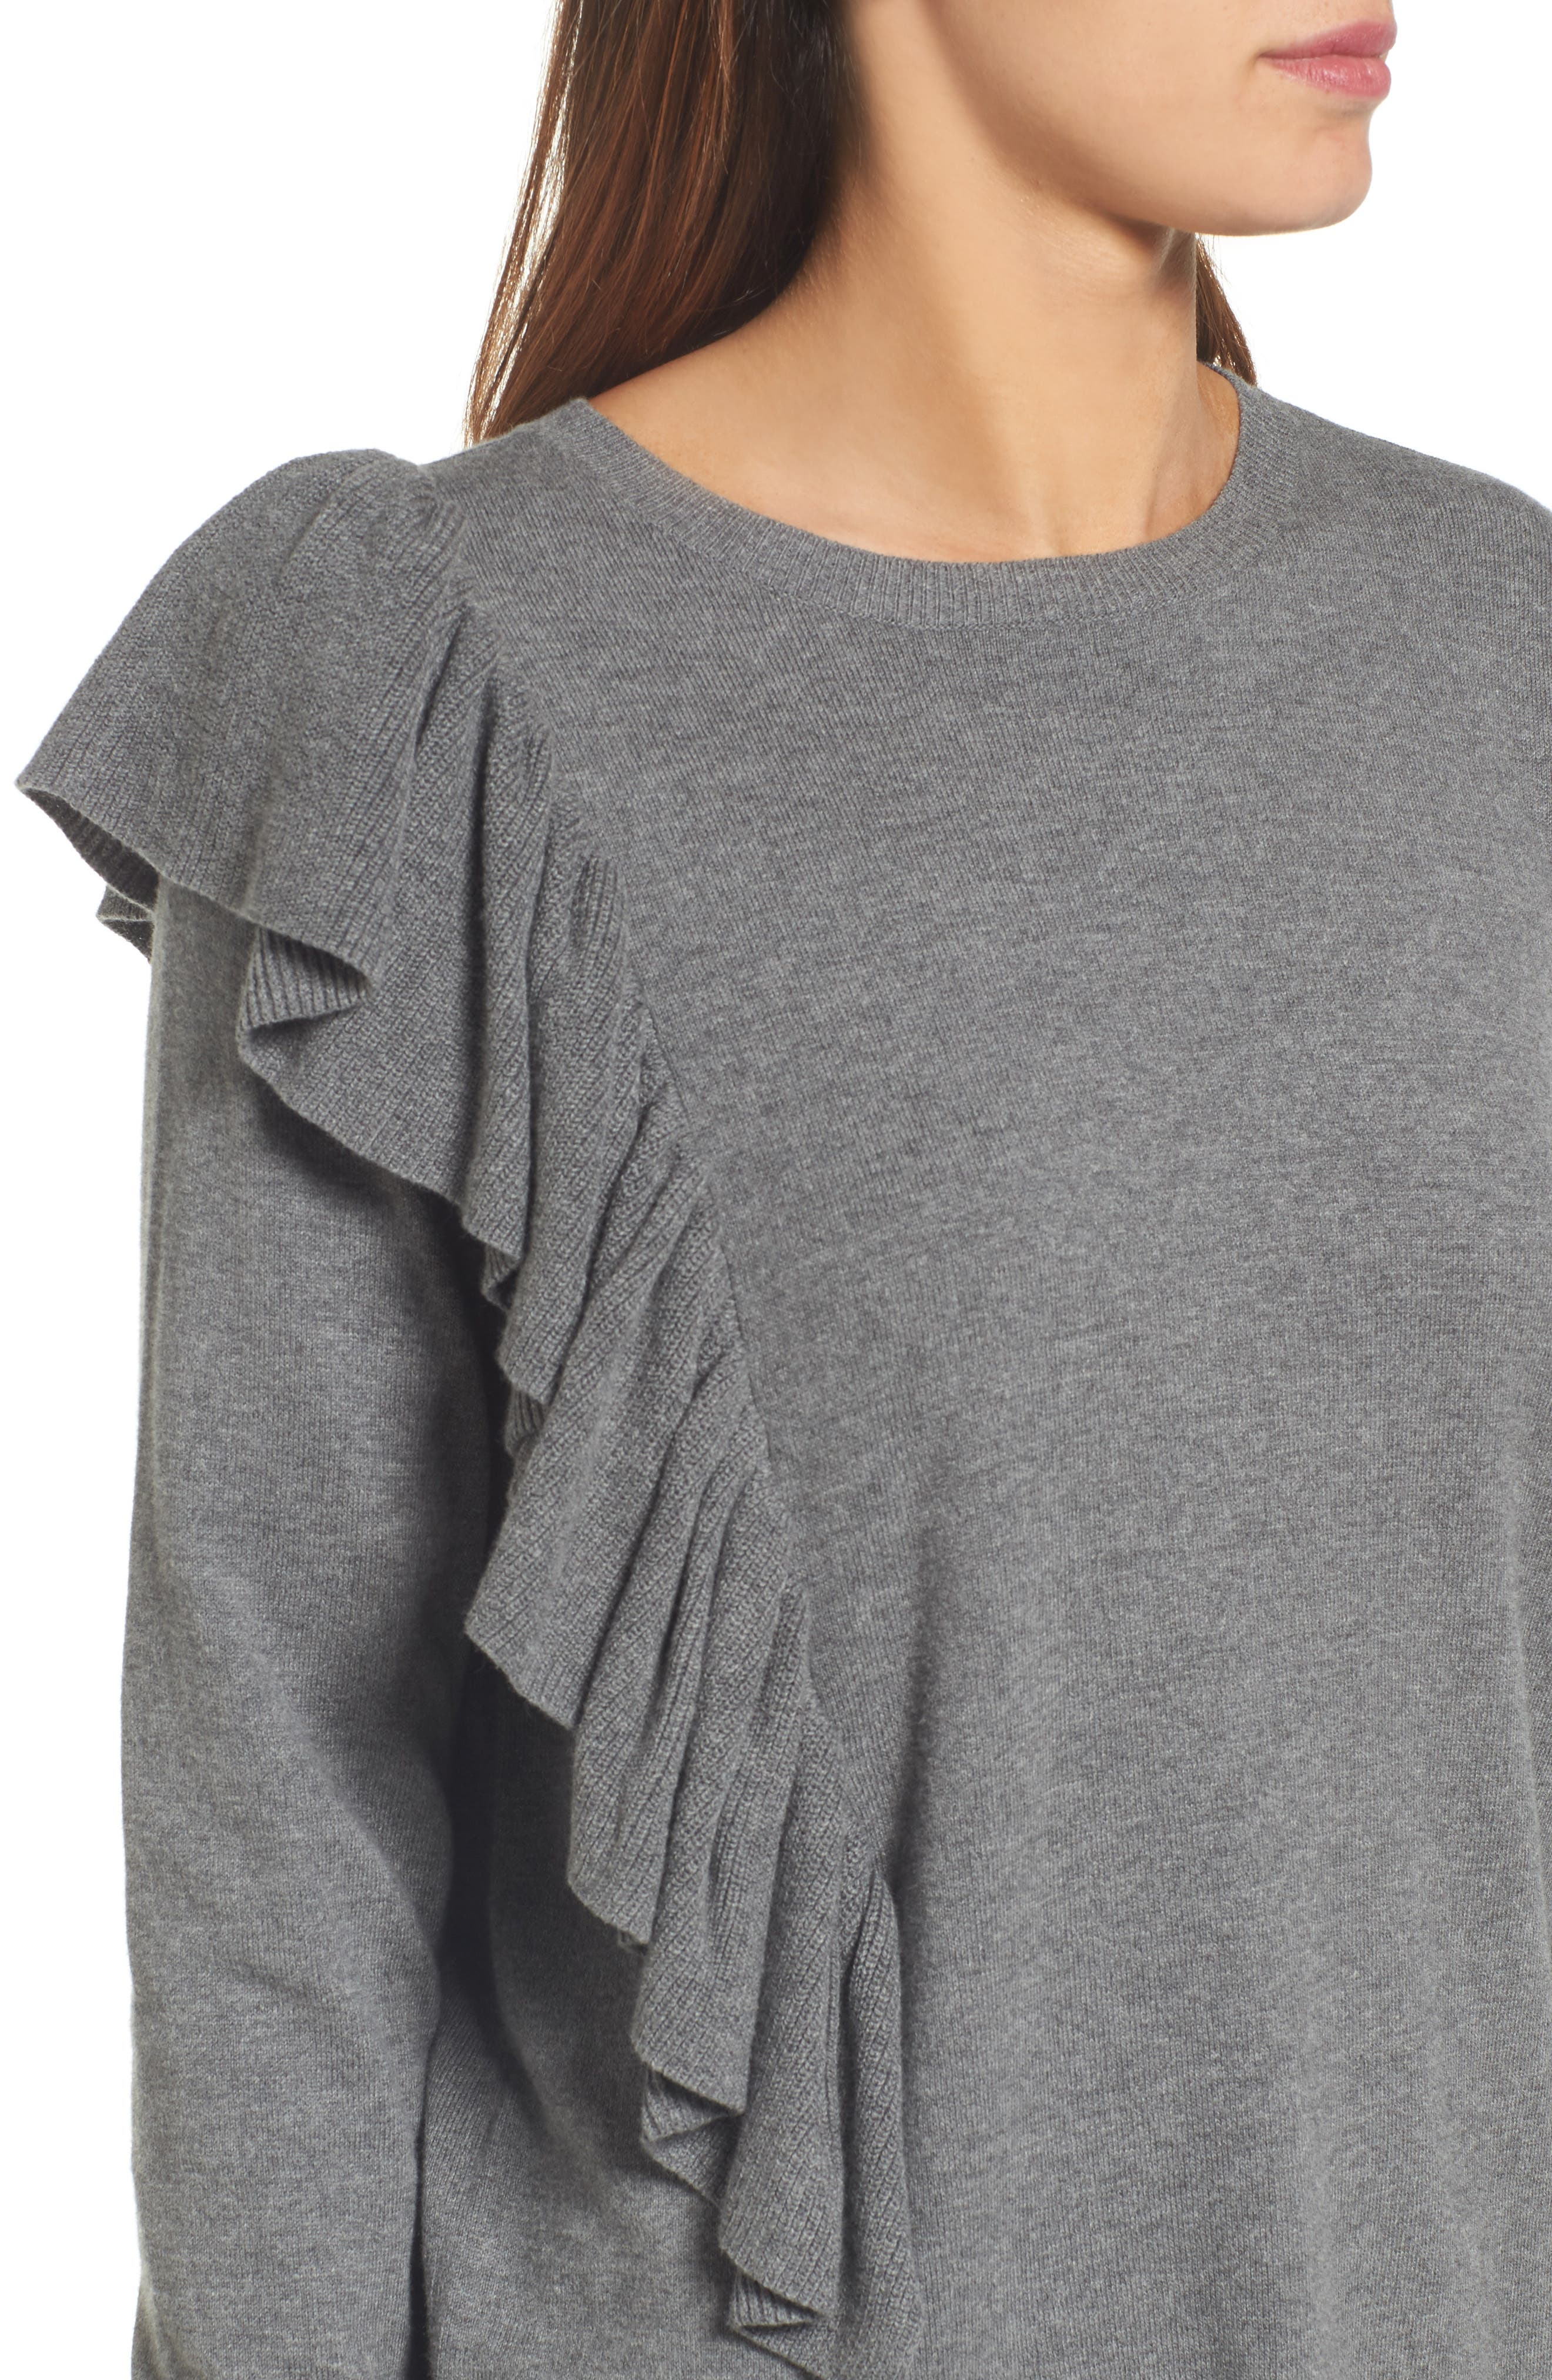 Asymmetrical Ruffle Sweater,                             Alternate thumbnail 4, color,                             030